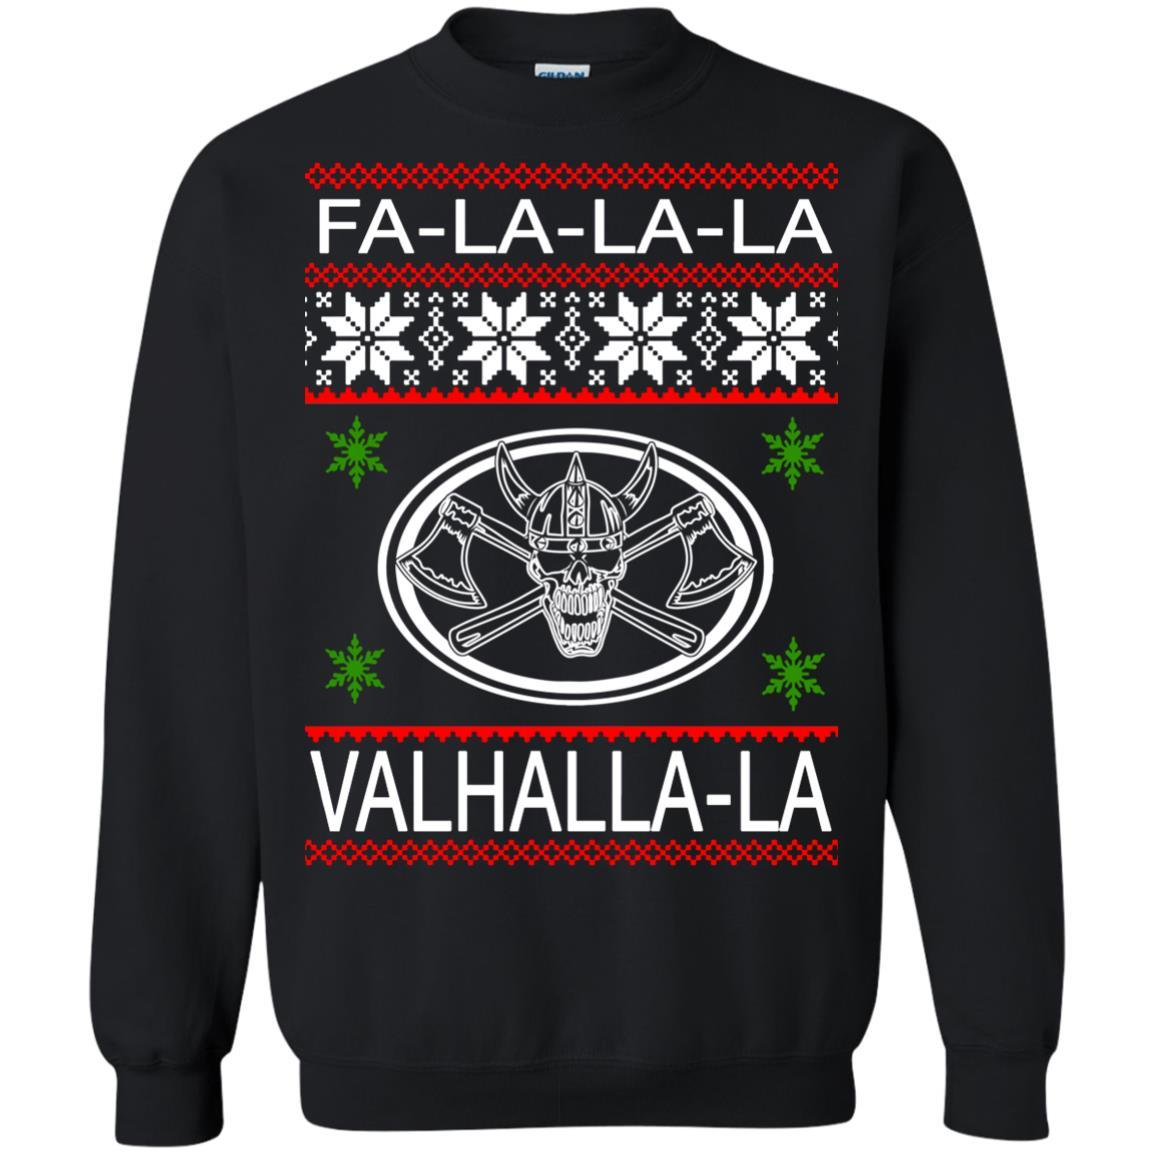 image 2931 - Valhalla Viking Christmas Sweater, Hoodie, Long Sleeve